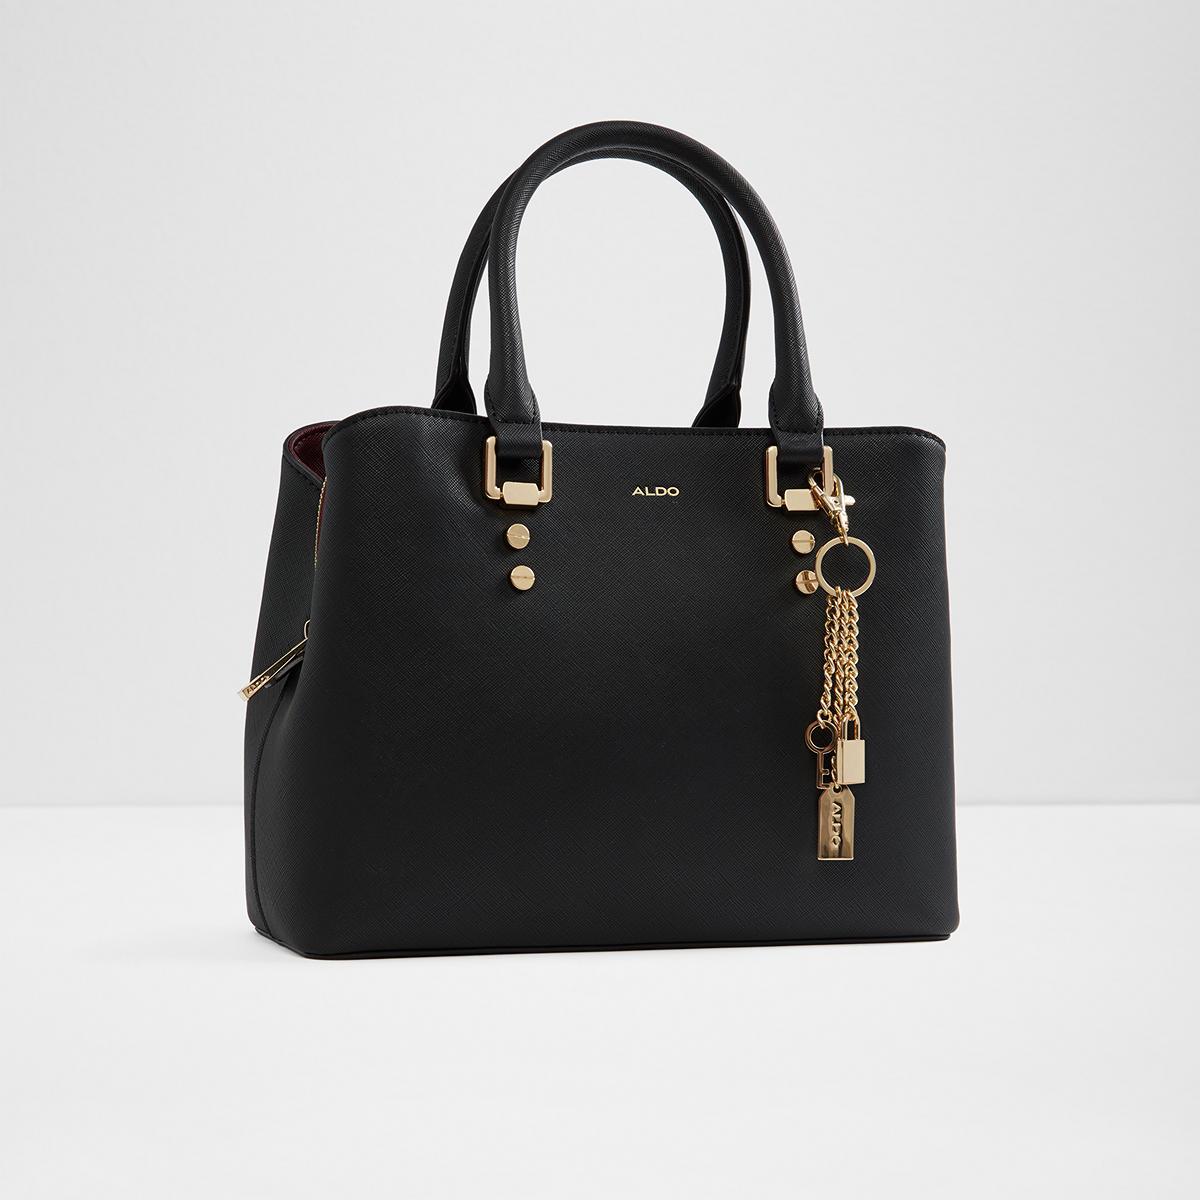 771311da57e Legoiri midnight black womens totes aldo canada jpg 1200x1200 Aldo bags  purses